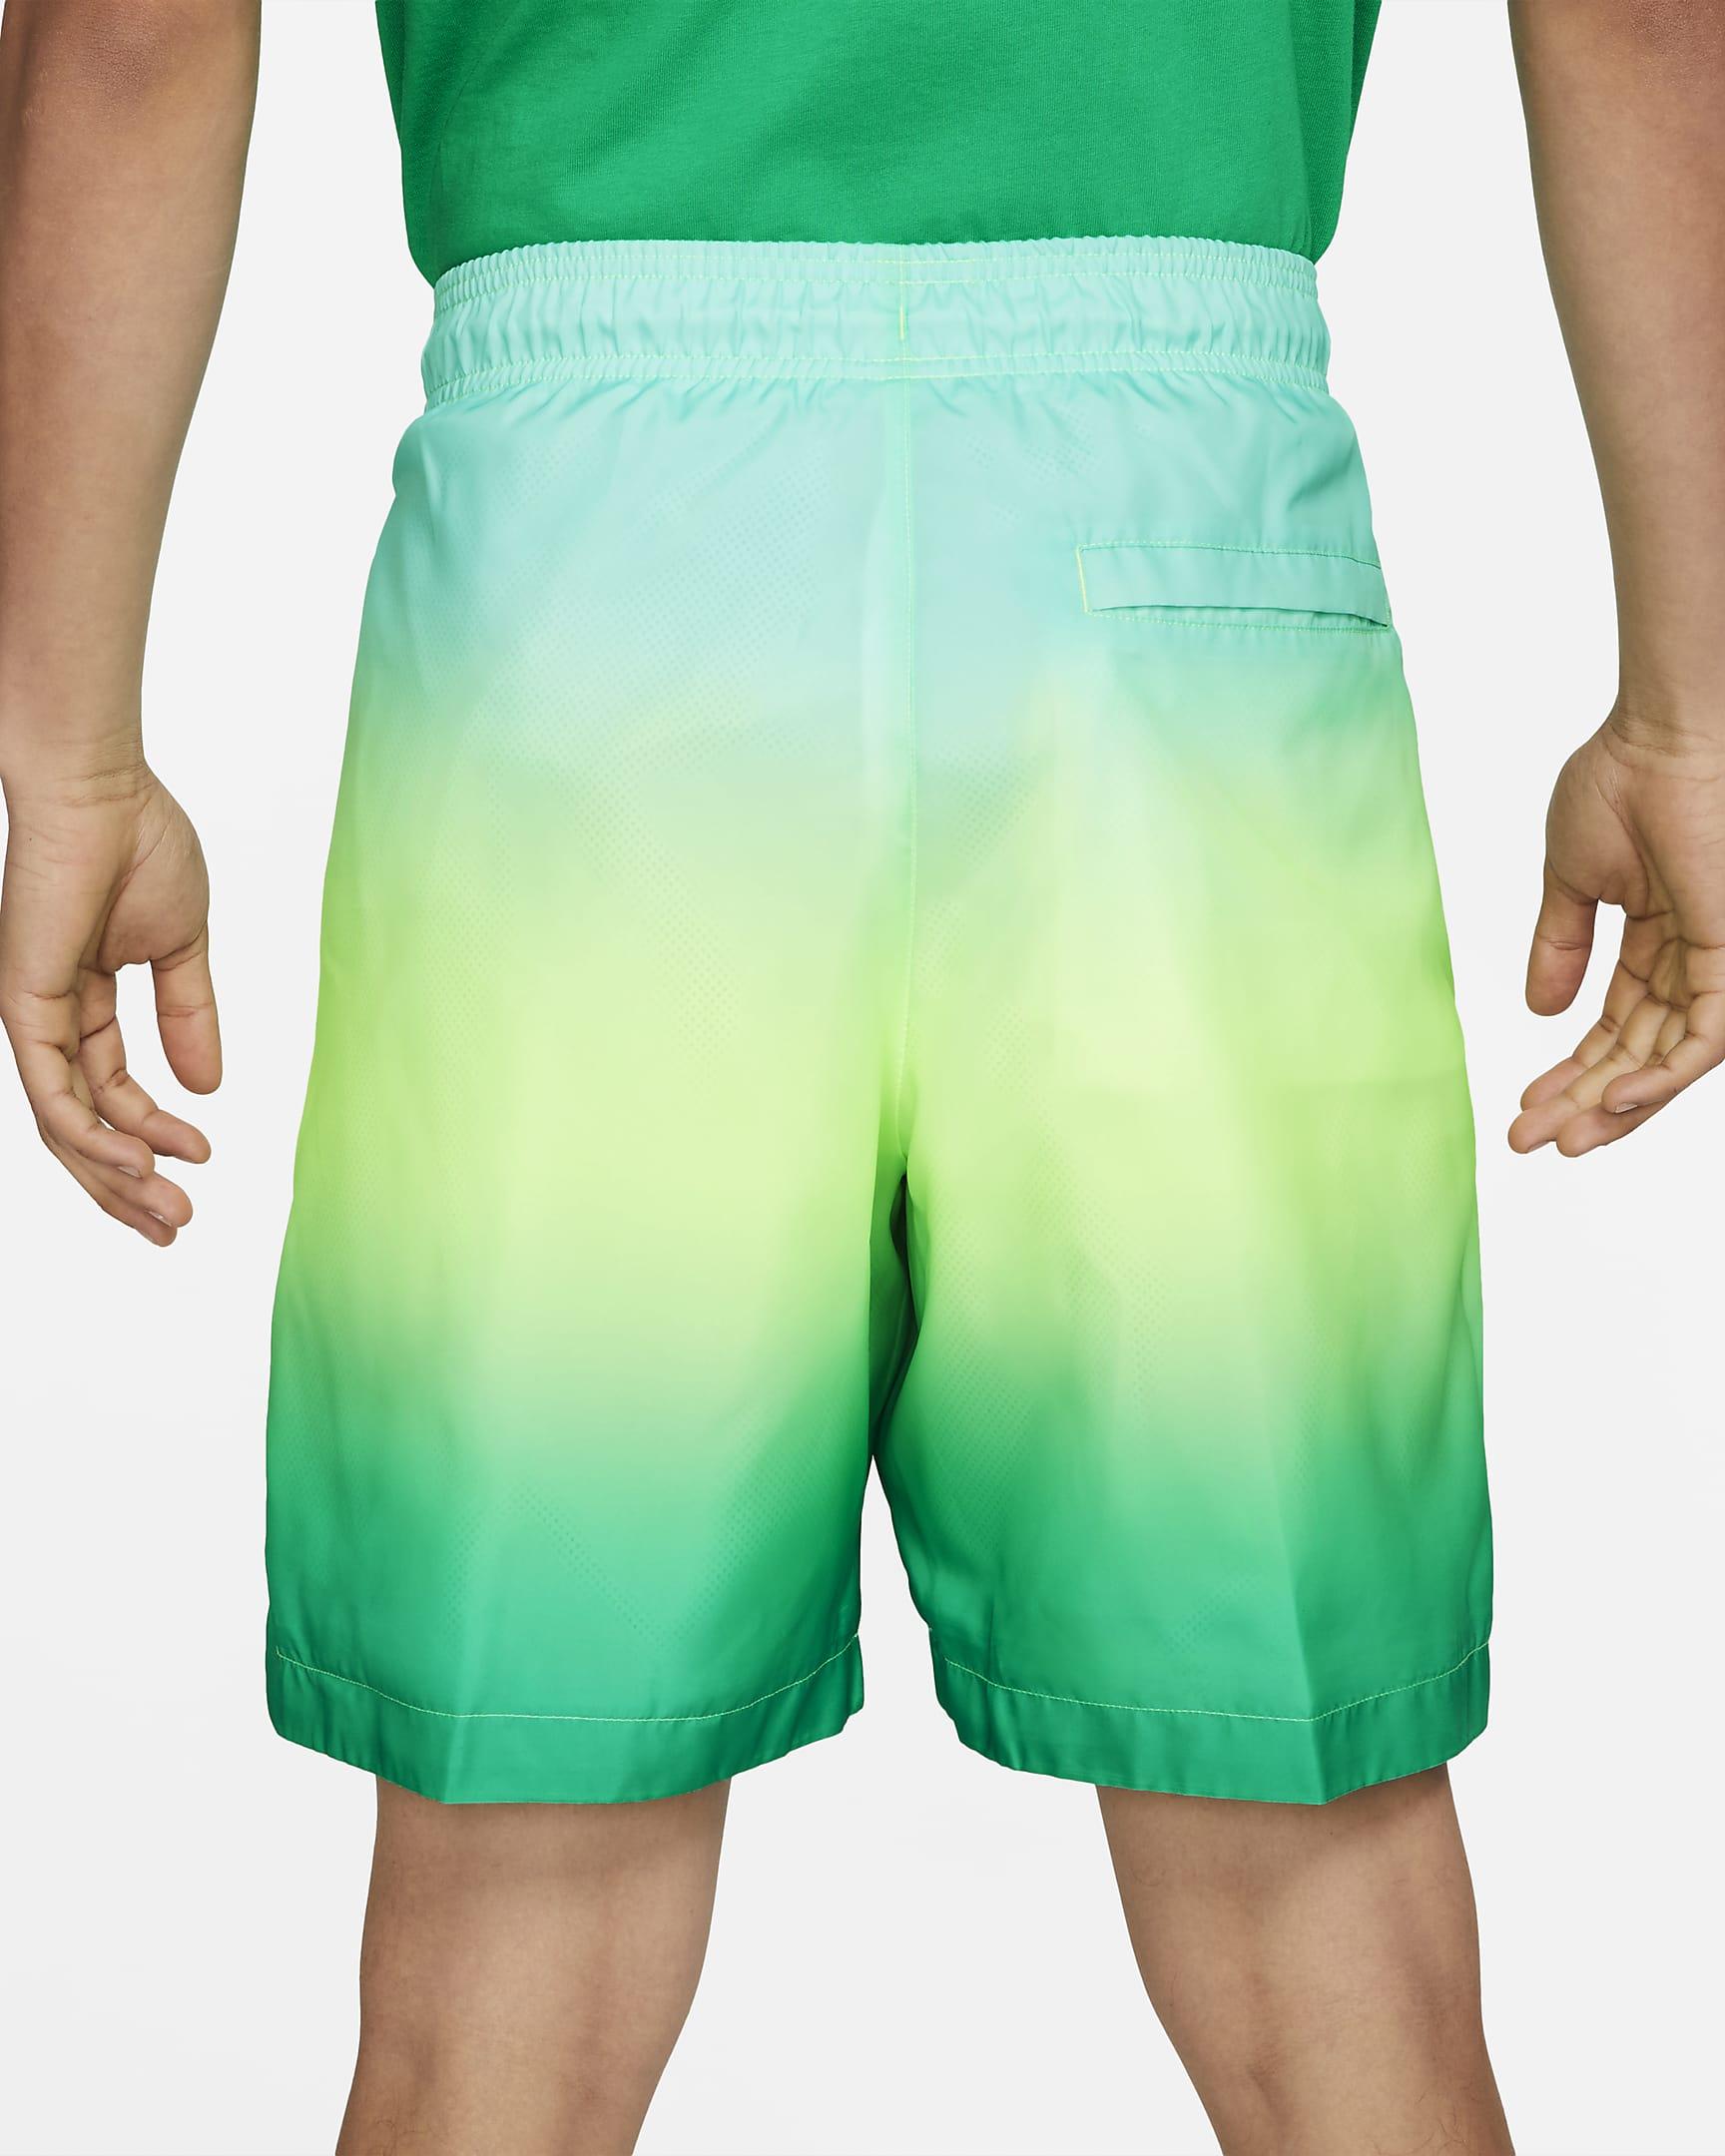 jordan-sport-dna-mens-pool-shorts-MklHwc-1.png